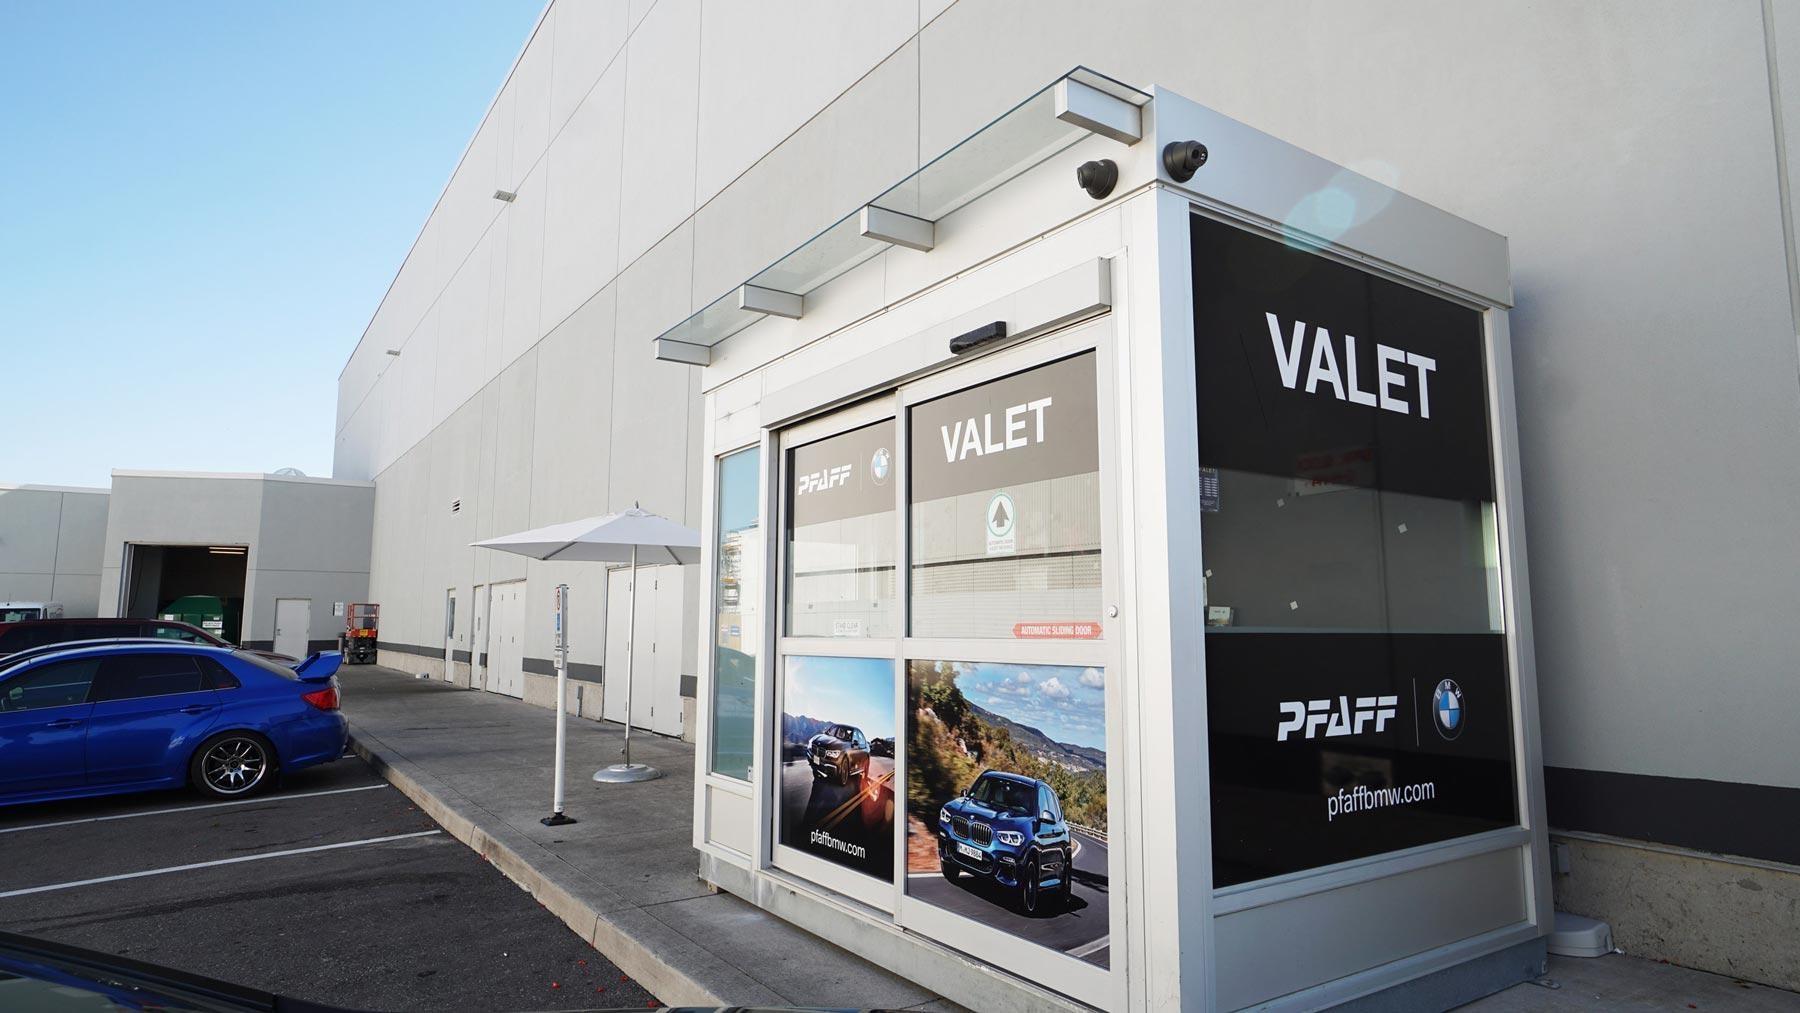 Valet Partnership with Pfaff